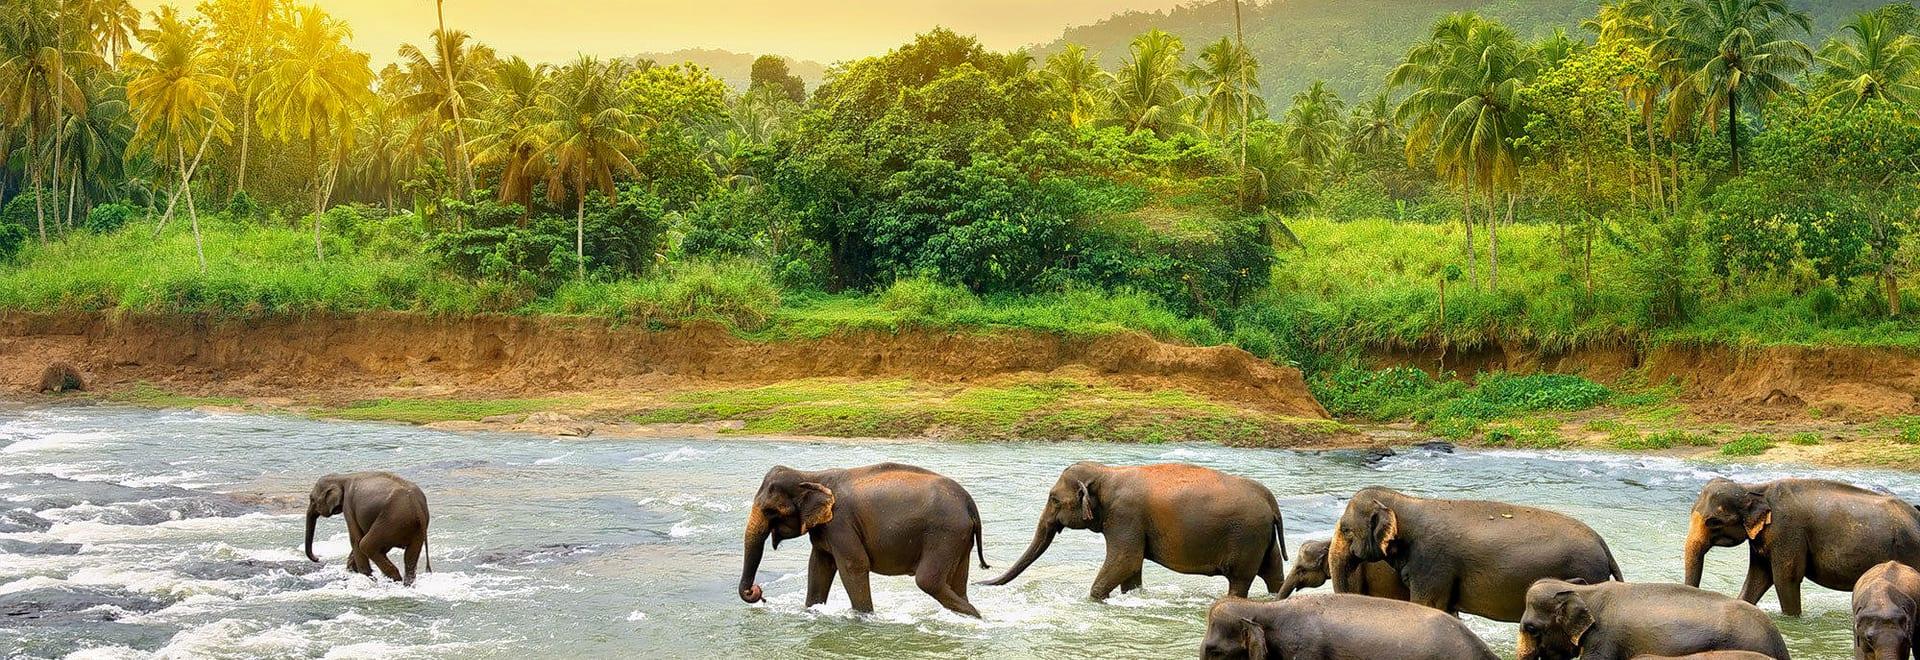 1520338125_elephant.jpg